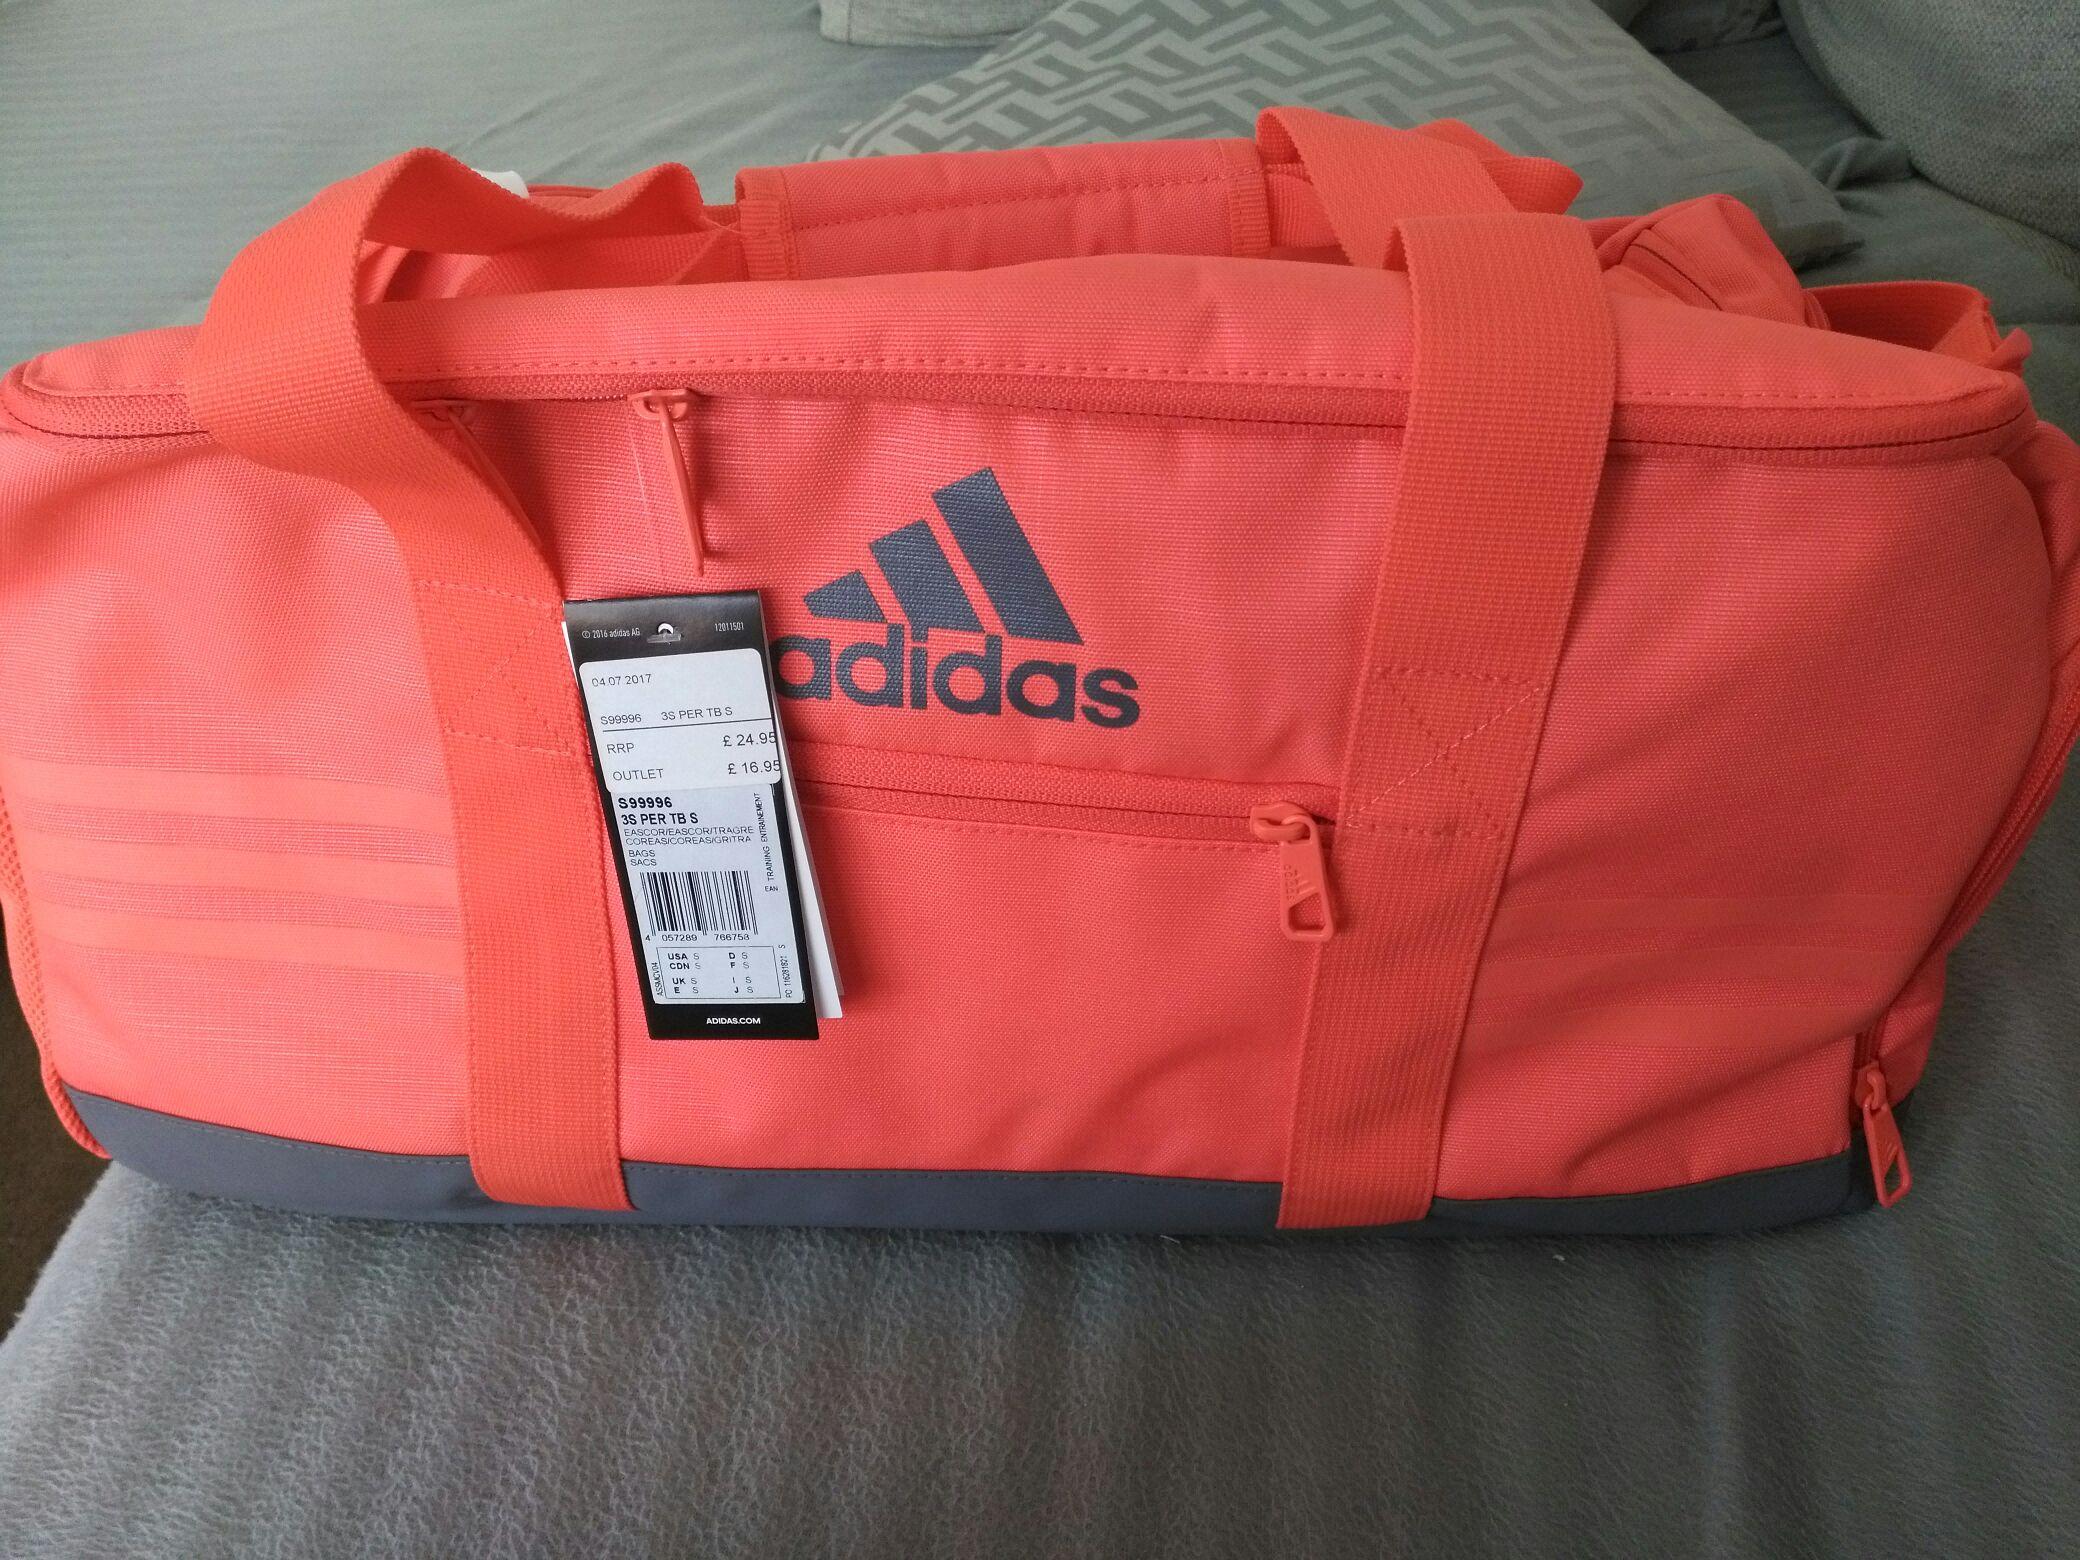 Adidas medium size handbag £16.95 adidas outlet in ashford